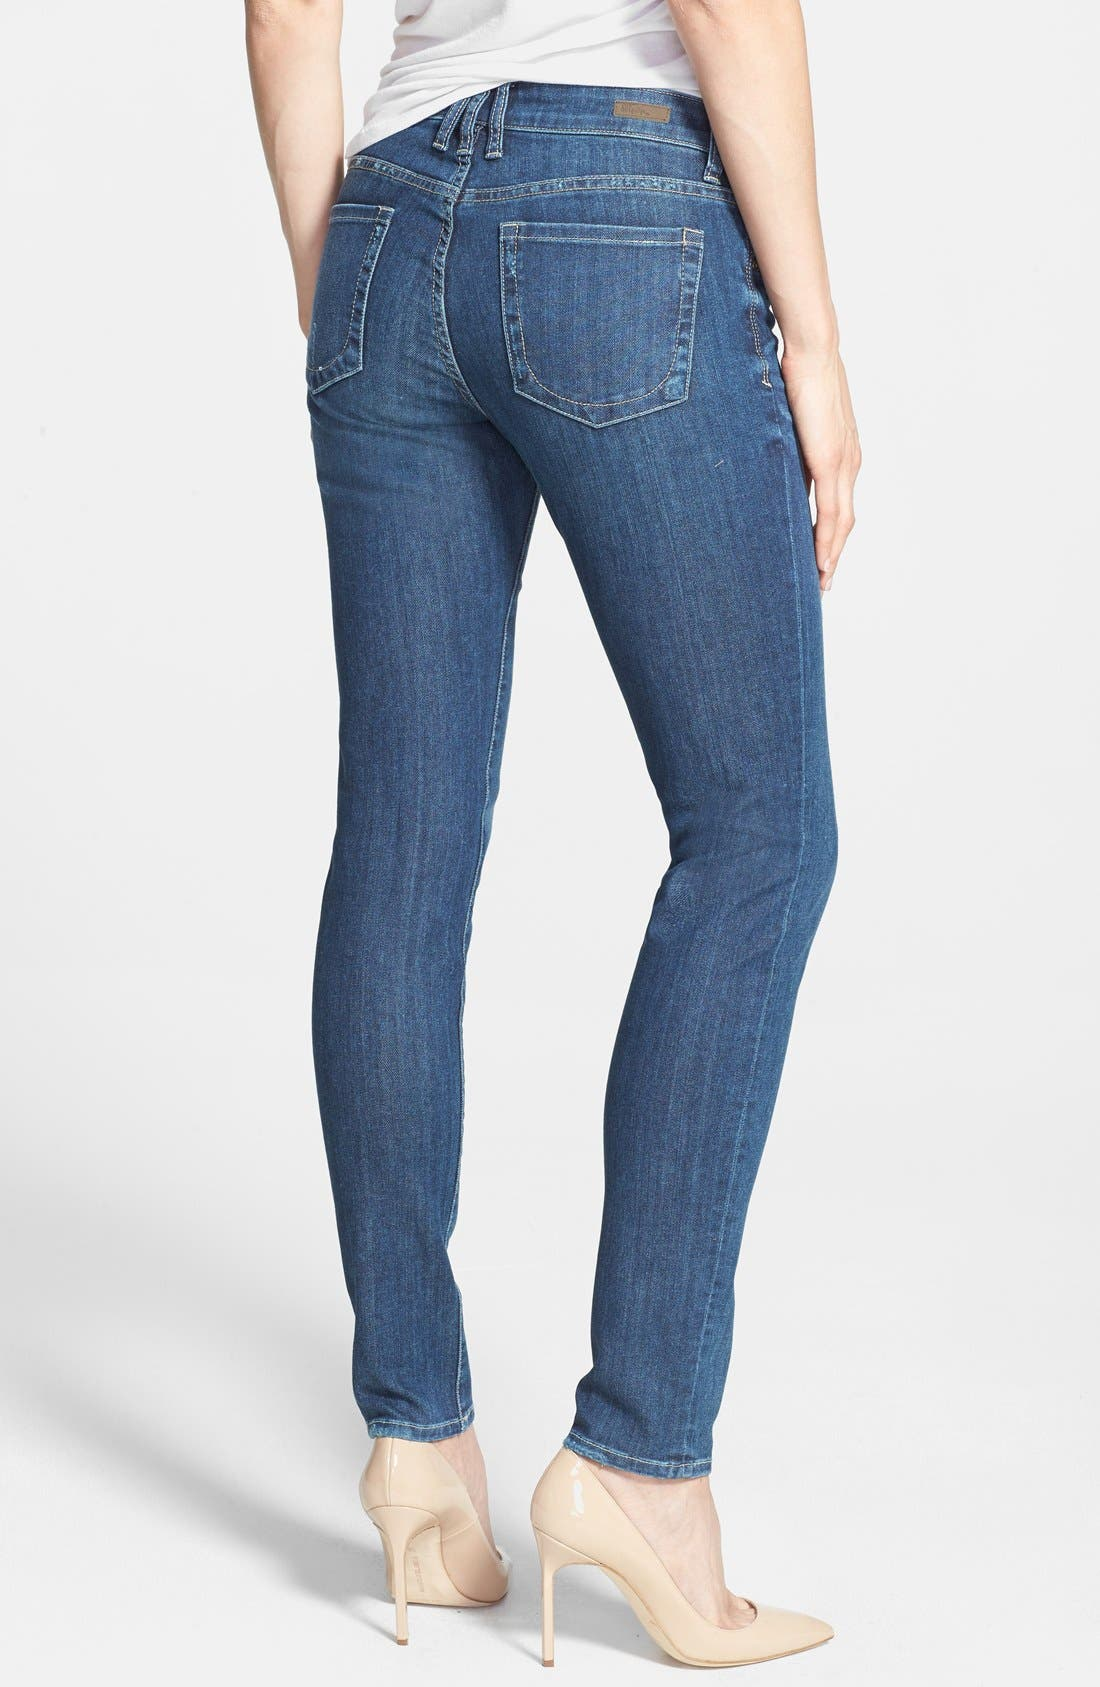 Alternate Image 2  - KUT from the Kloth 'Mia' Stretch Skinny Jeans (Effect) (Regular & Petite)